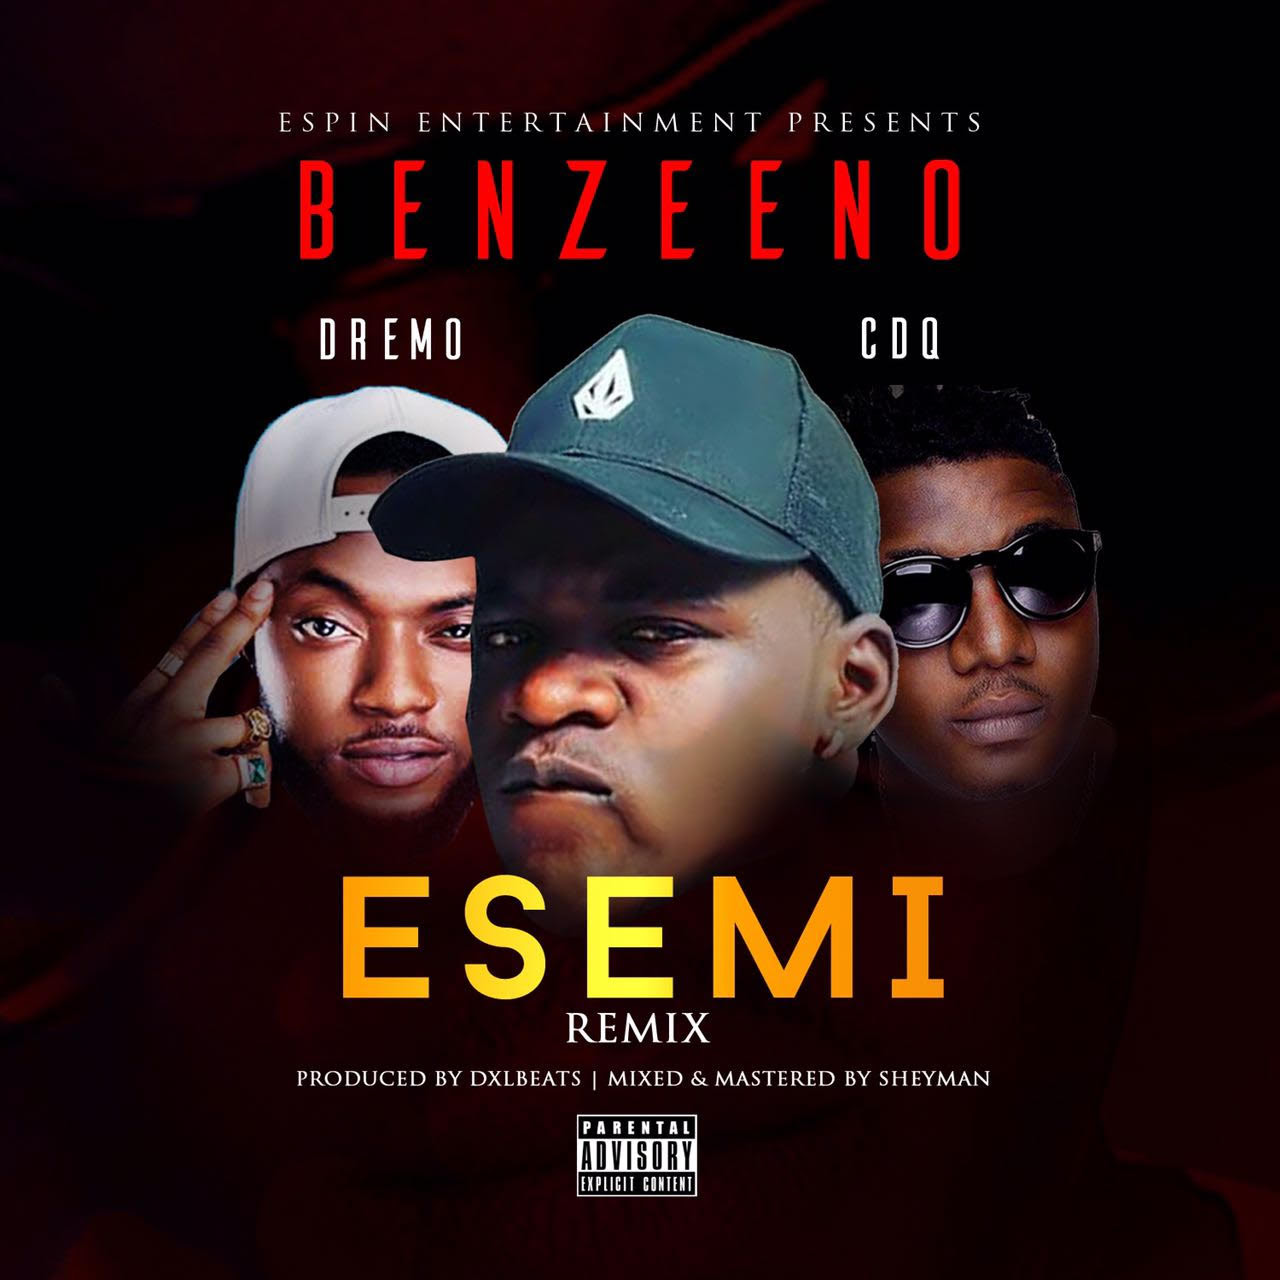 VIDEO: Benzeeno ft. CDQ & Dremo – Ese Mi (Remix)